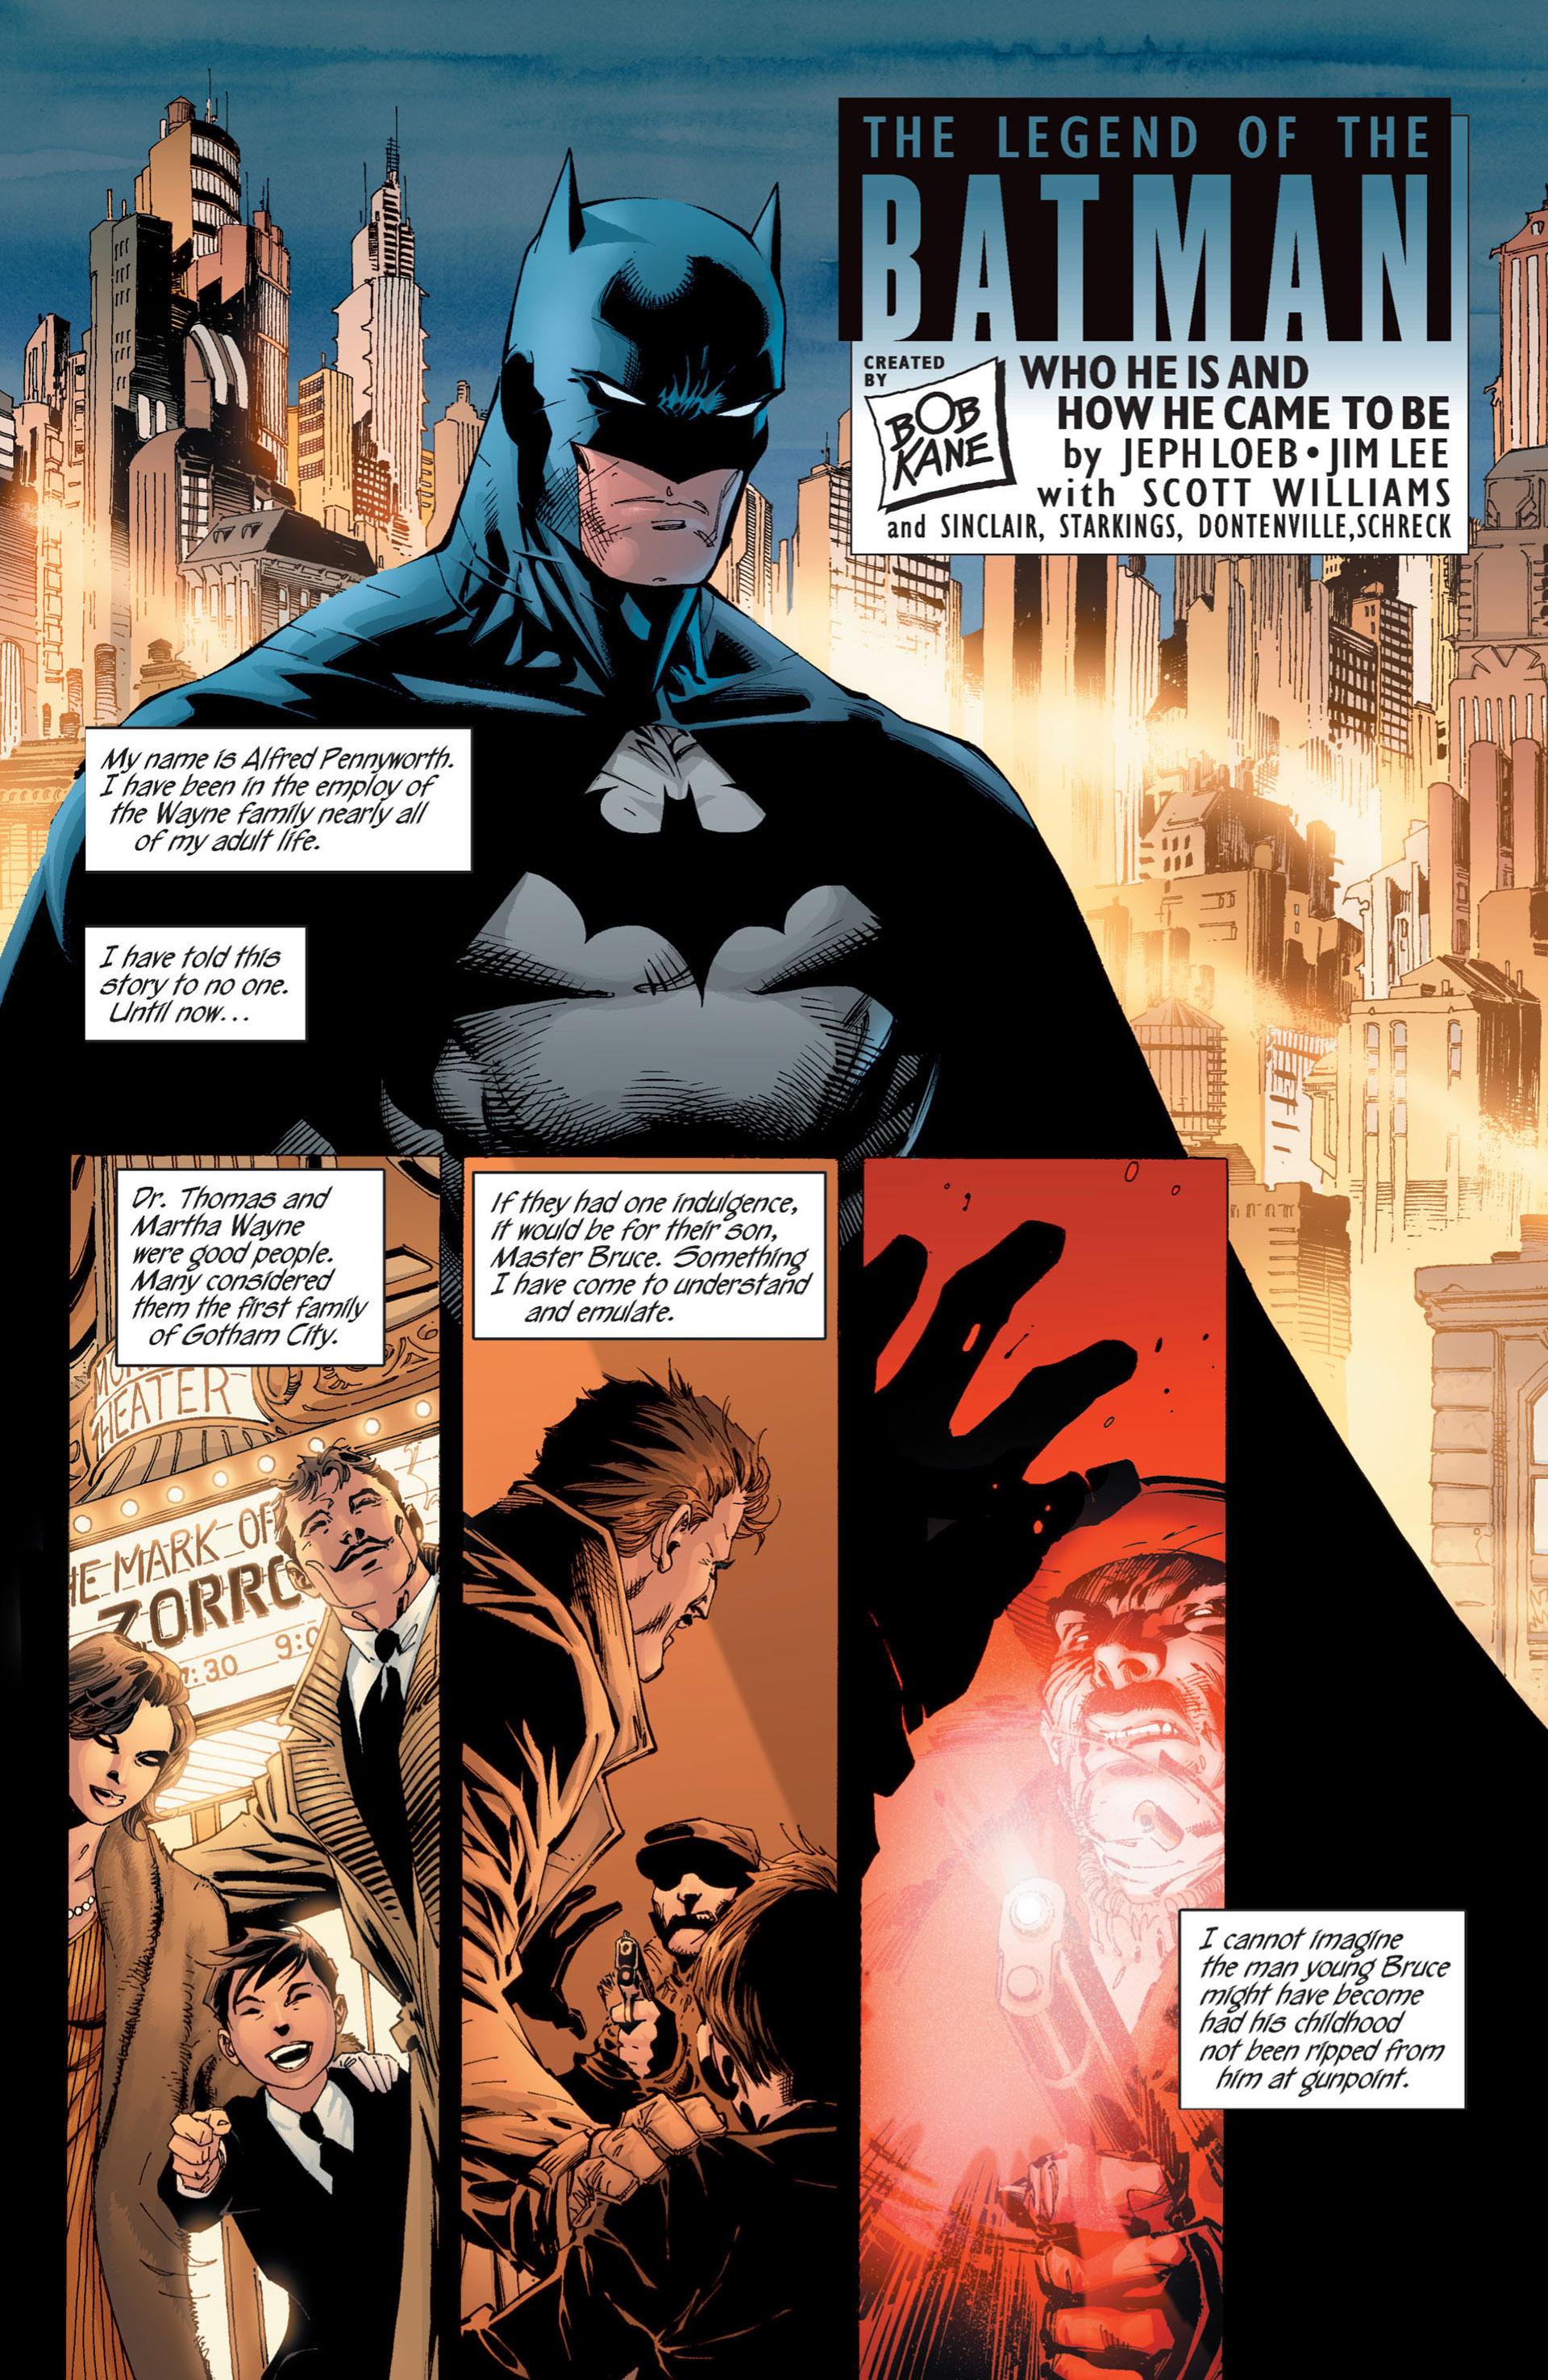 Psychology of Bruce Wayne CtHPxVuCFGq5pHd2oQQ2PSDOkNzRIkGaBavAja2T7BPEMfUFtSwrE_jmIQF023FMuZ11IK1E1A6i=s0